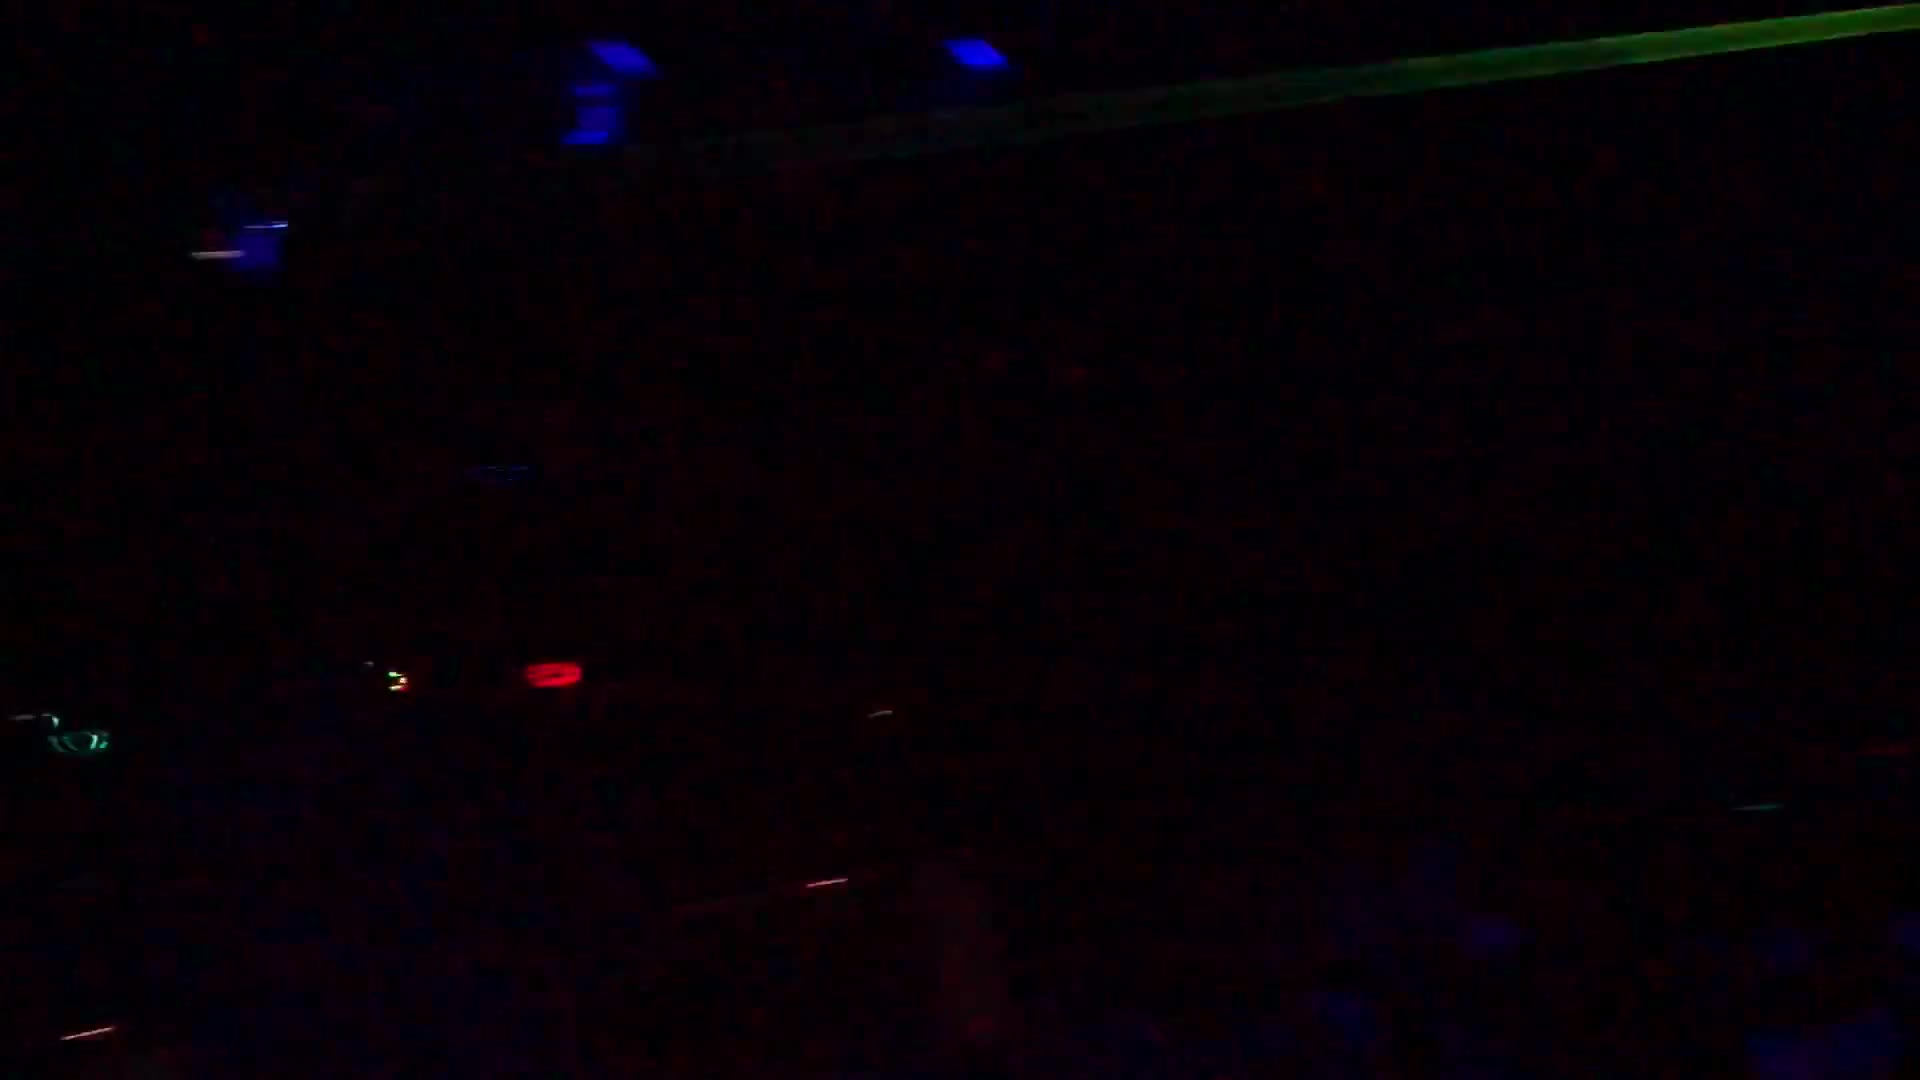 ANTHROCON, Major Kite, destiny2, DANCING ANIMALS GIFs